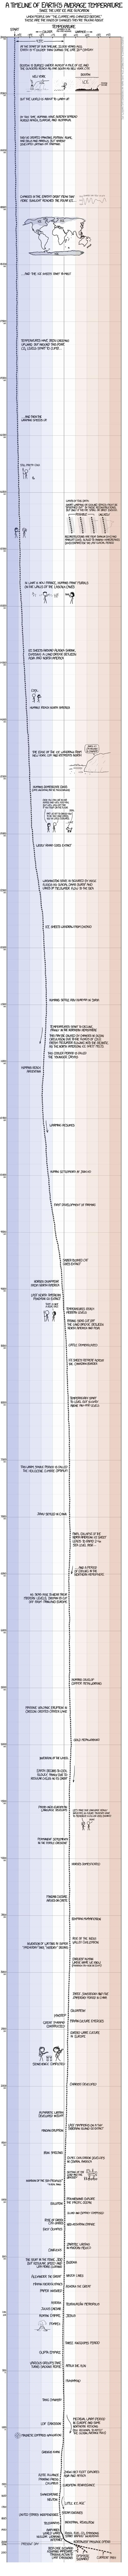 Earth's Temperature Timeline